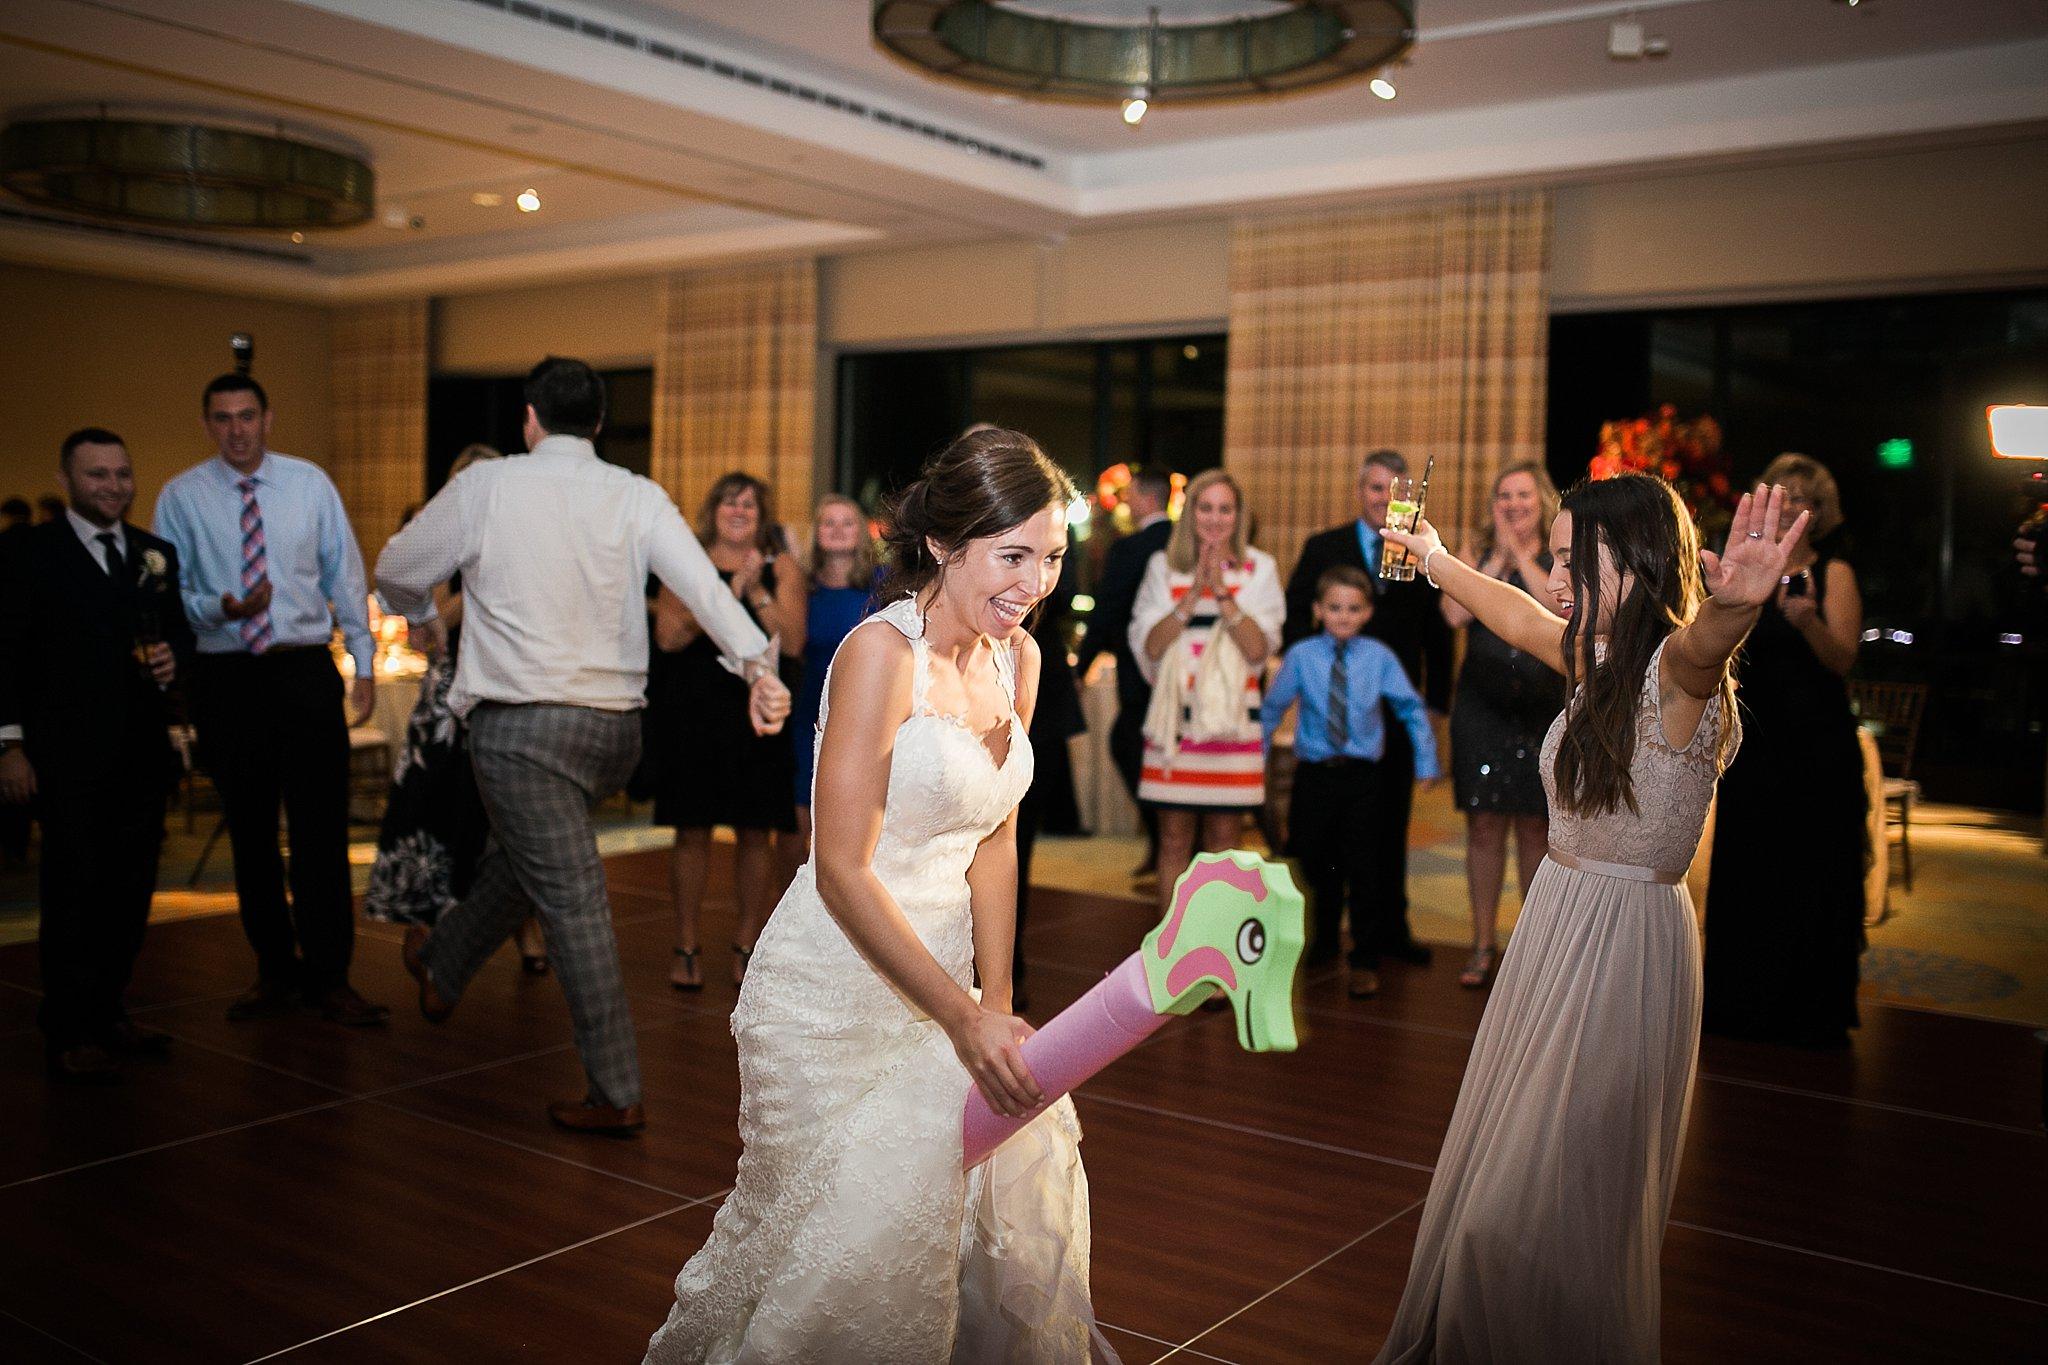 Seaport Hotel Wedding Boston Photographer Sweet Alice71.jpg